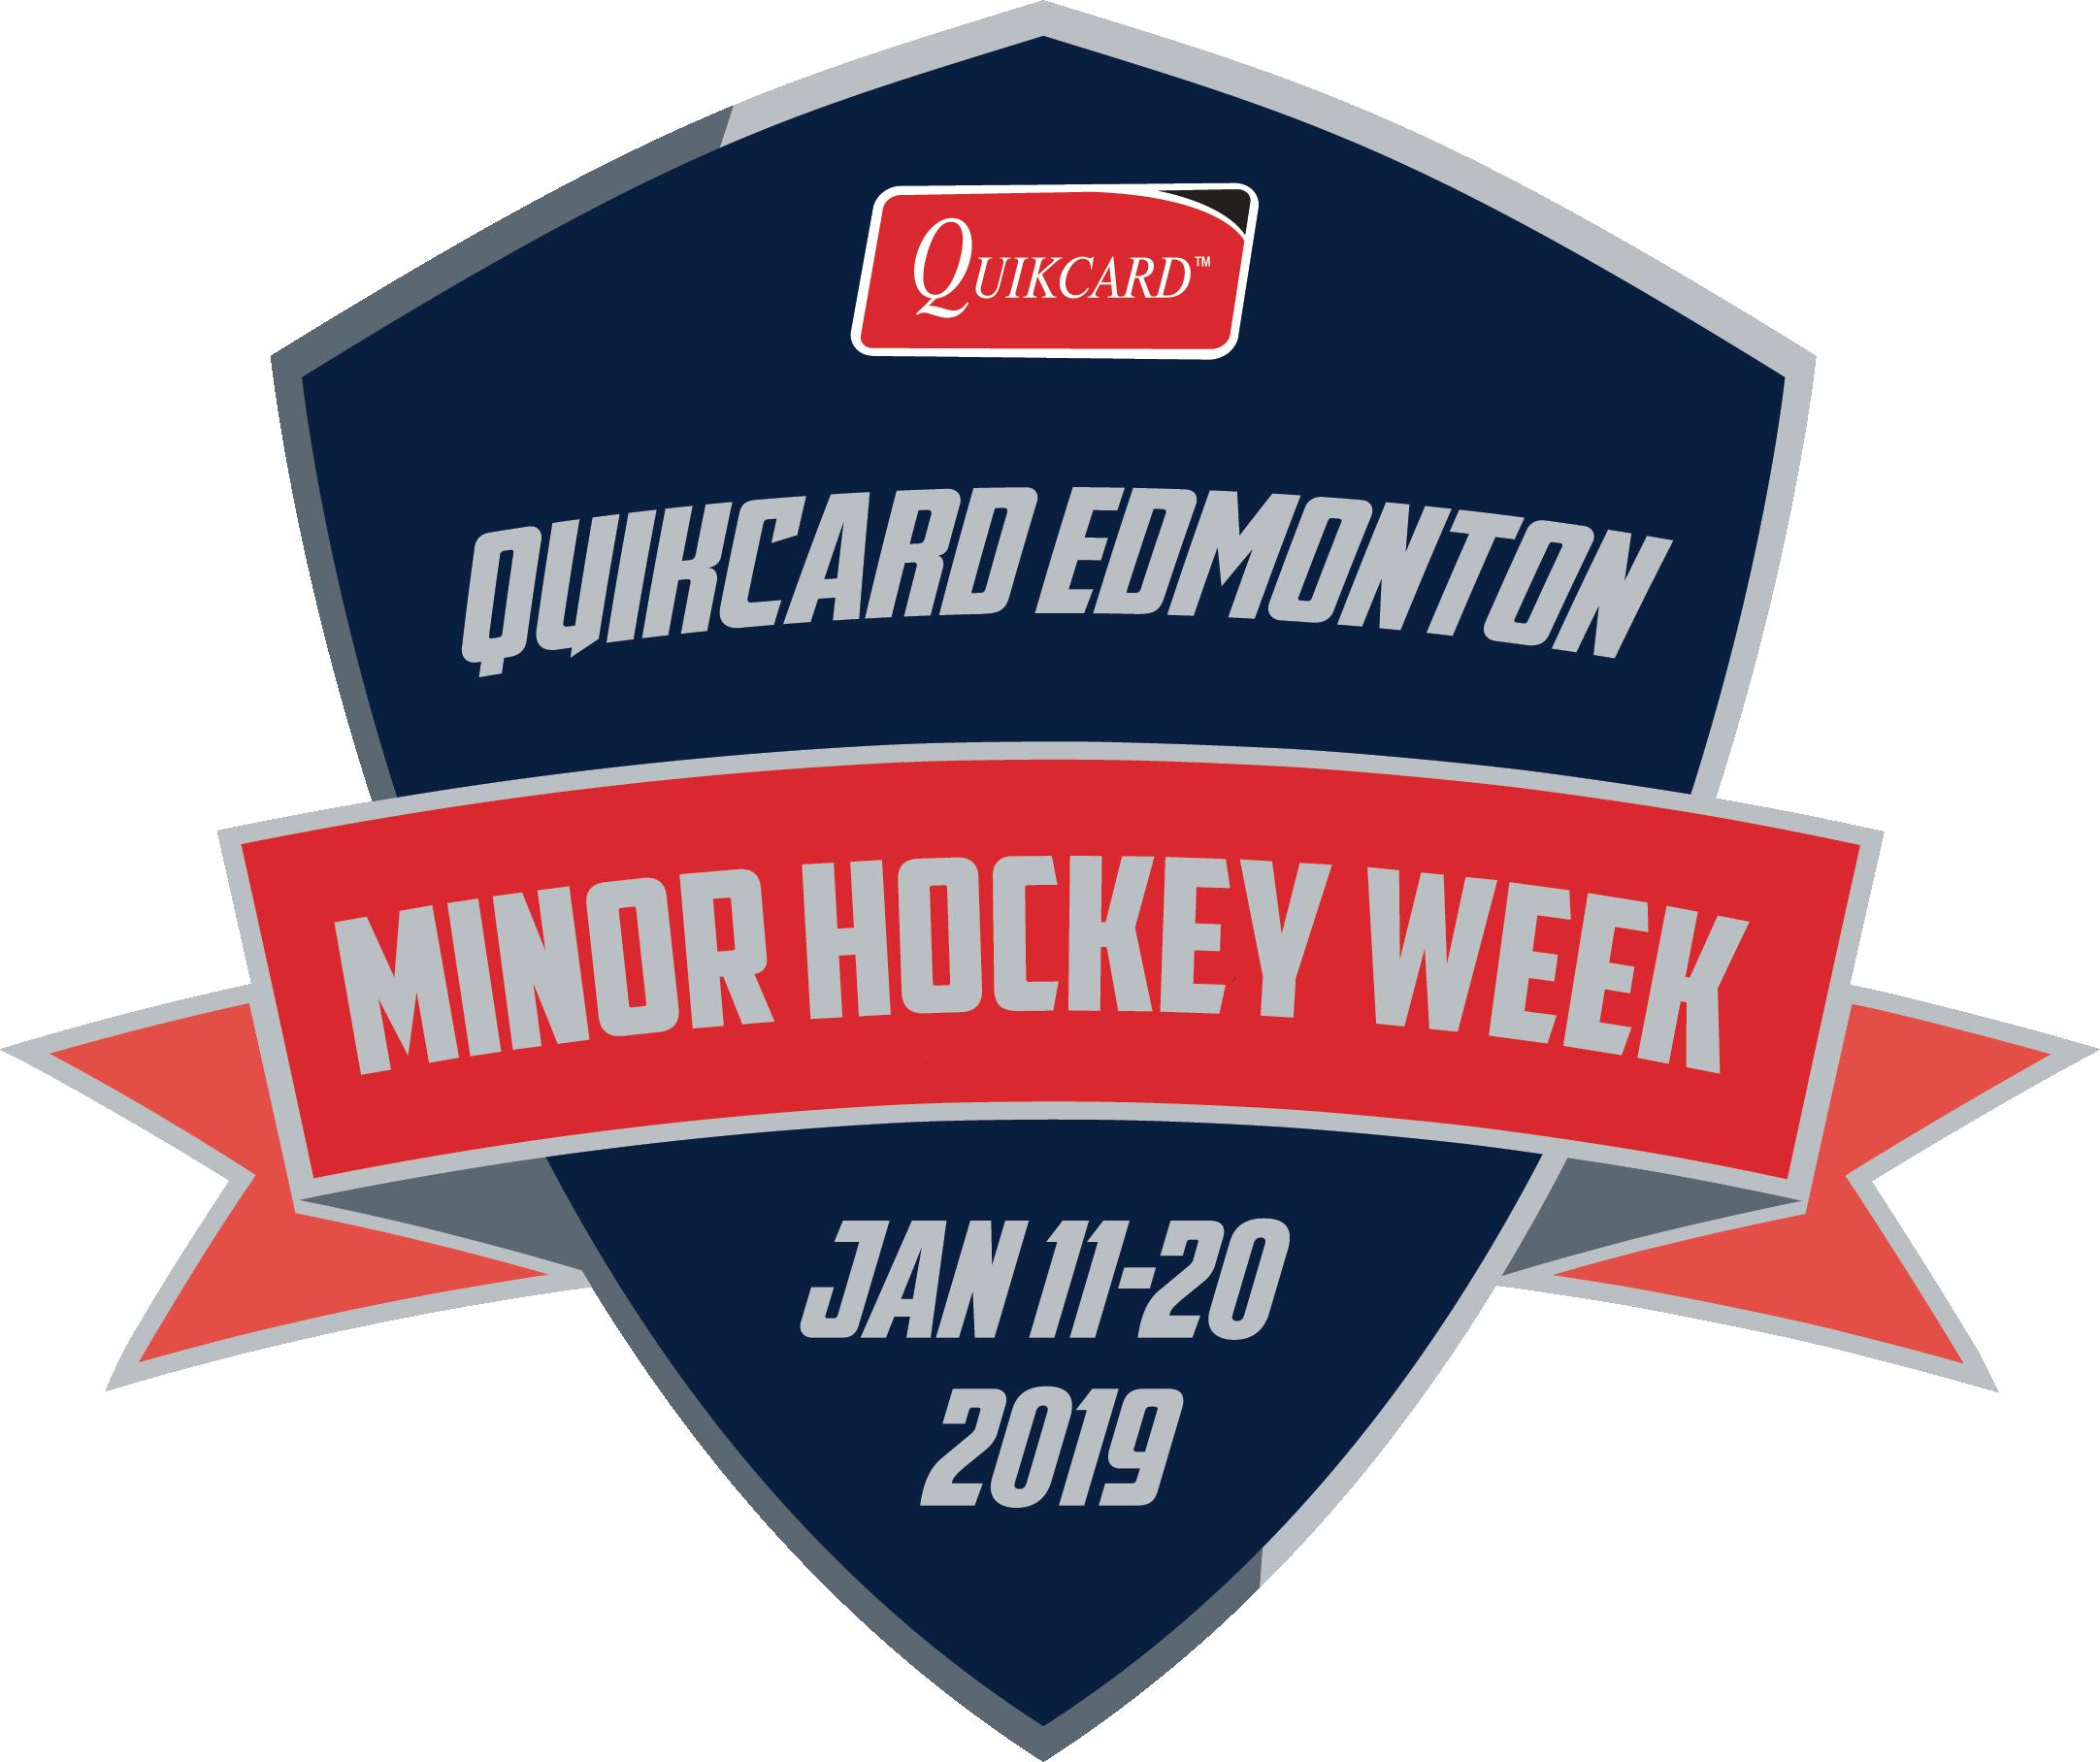 Quikcard Edmonton Minor Hockey Week Website By Ramp Interactive